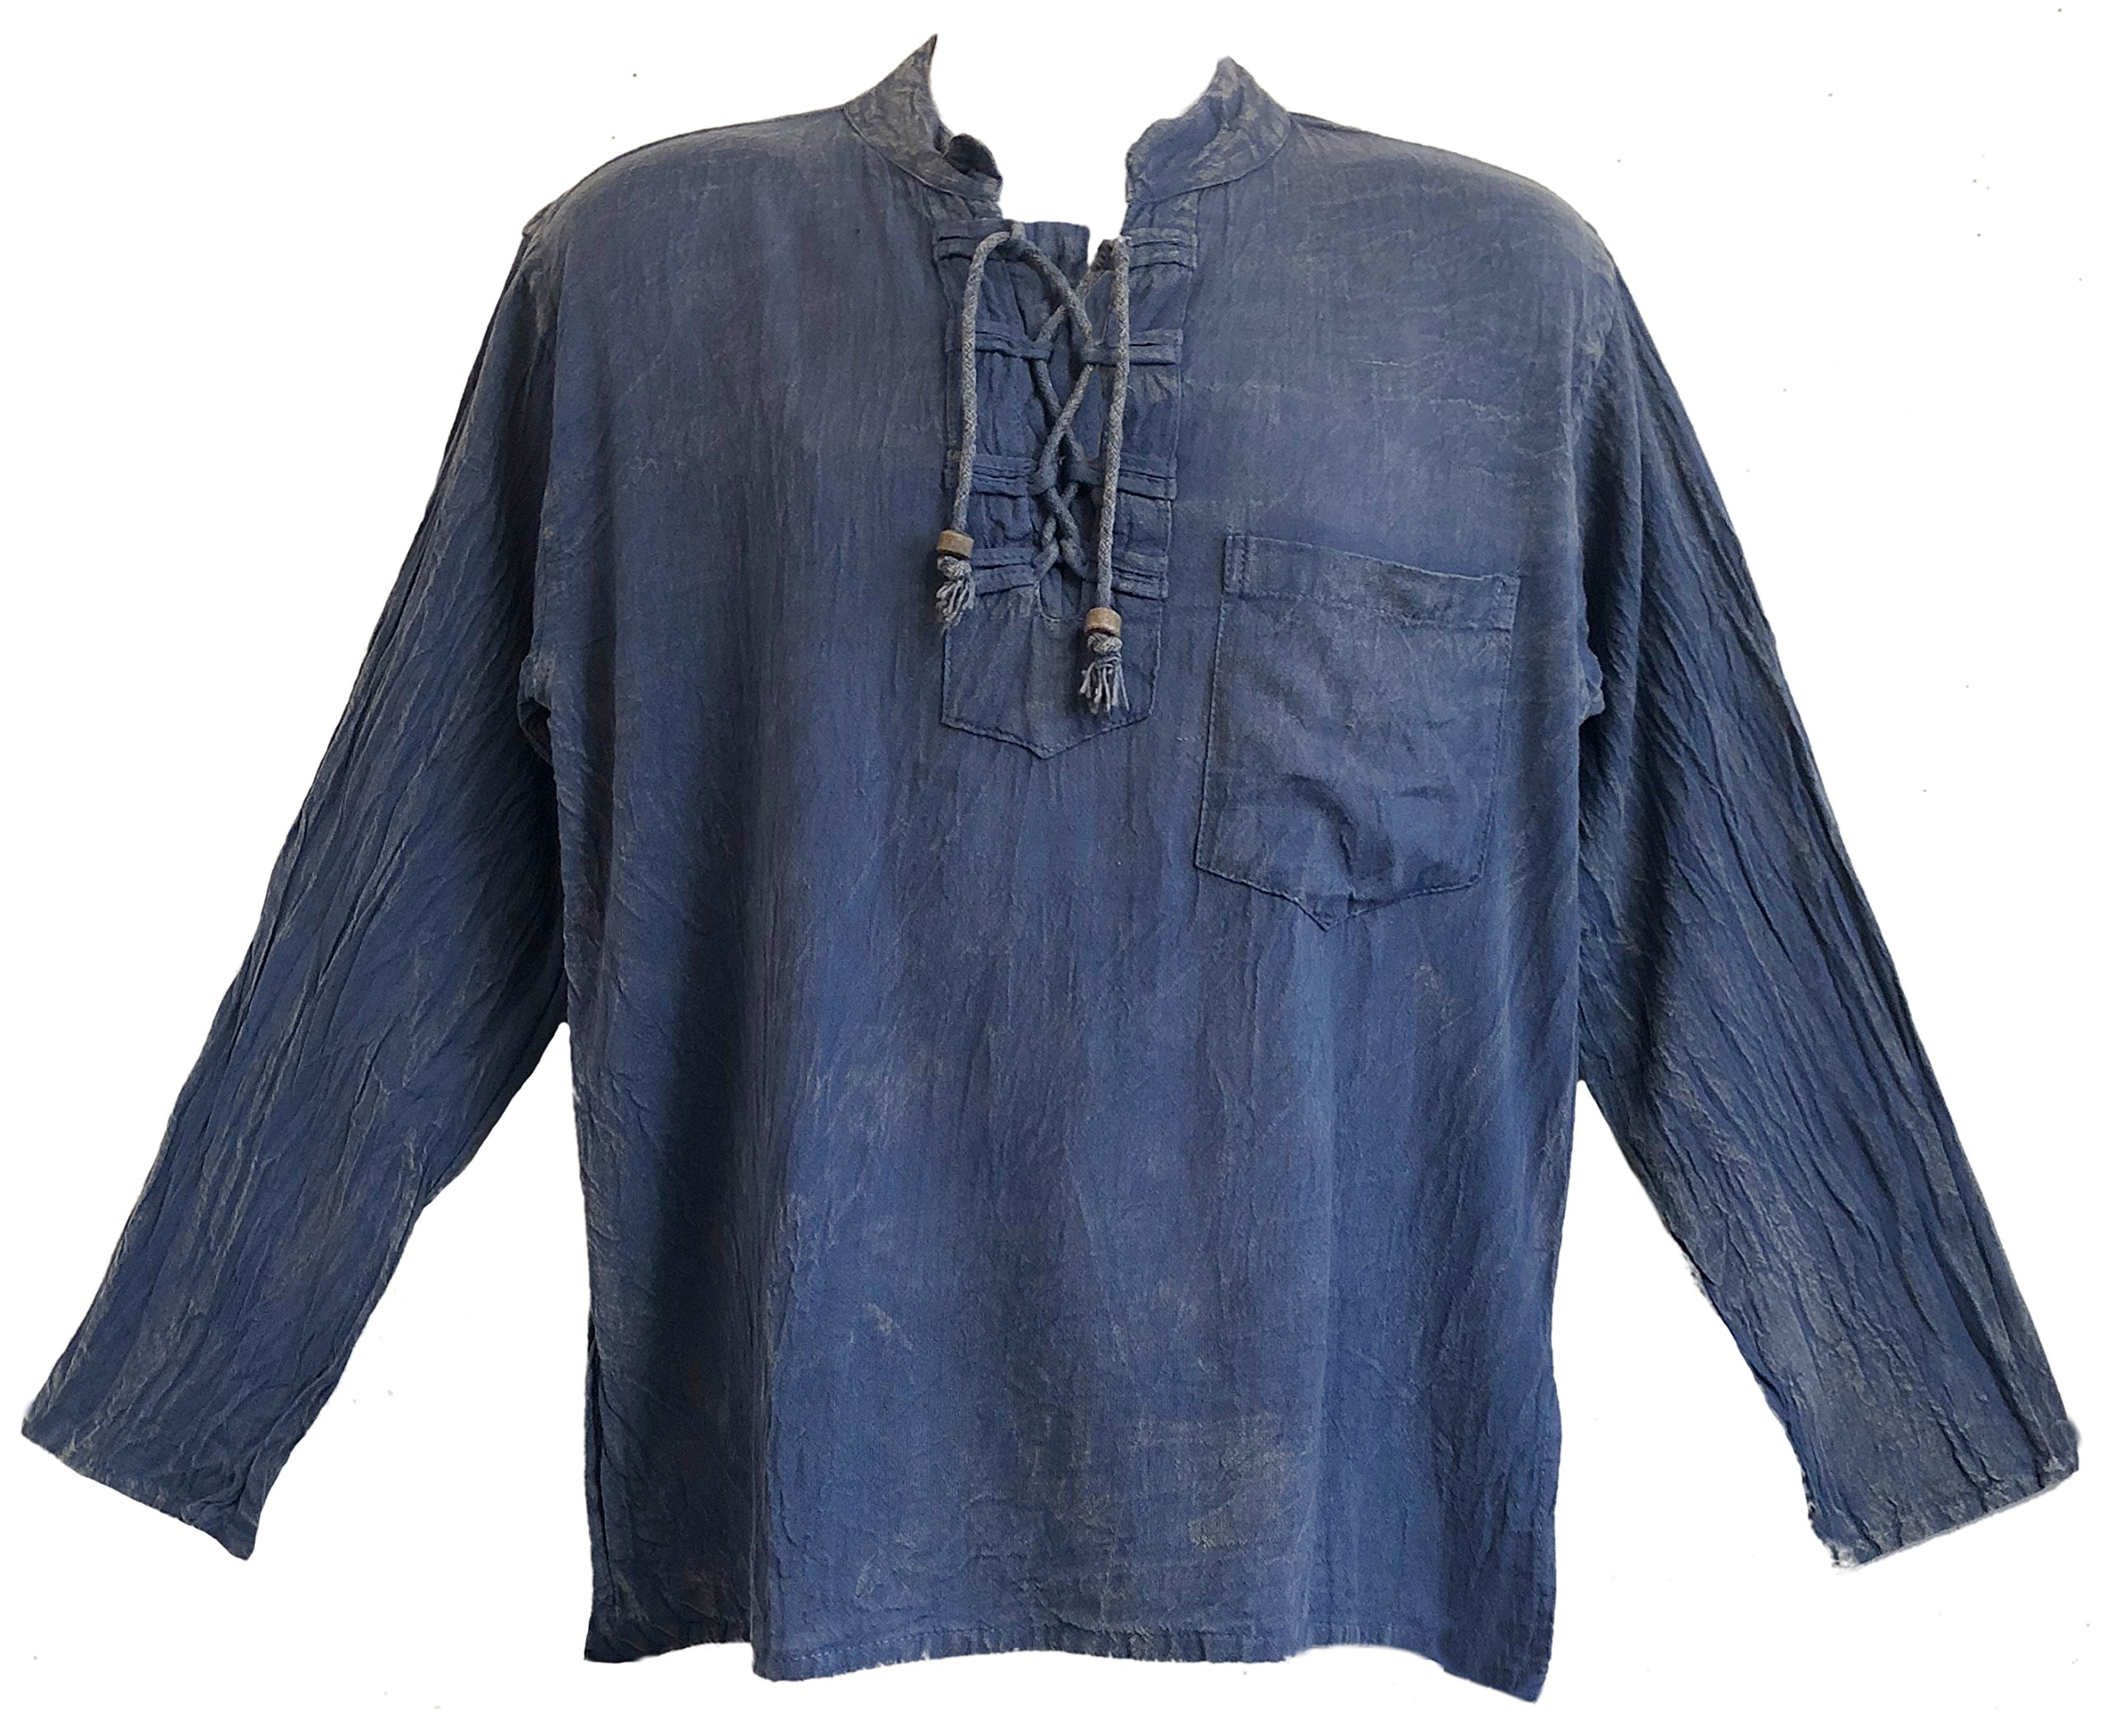 Yak & Yeti Men's Kurta Stone Washed Lightweight Cotton Embroidered Mandarin Style Collar (XXL, Blue Lace up)